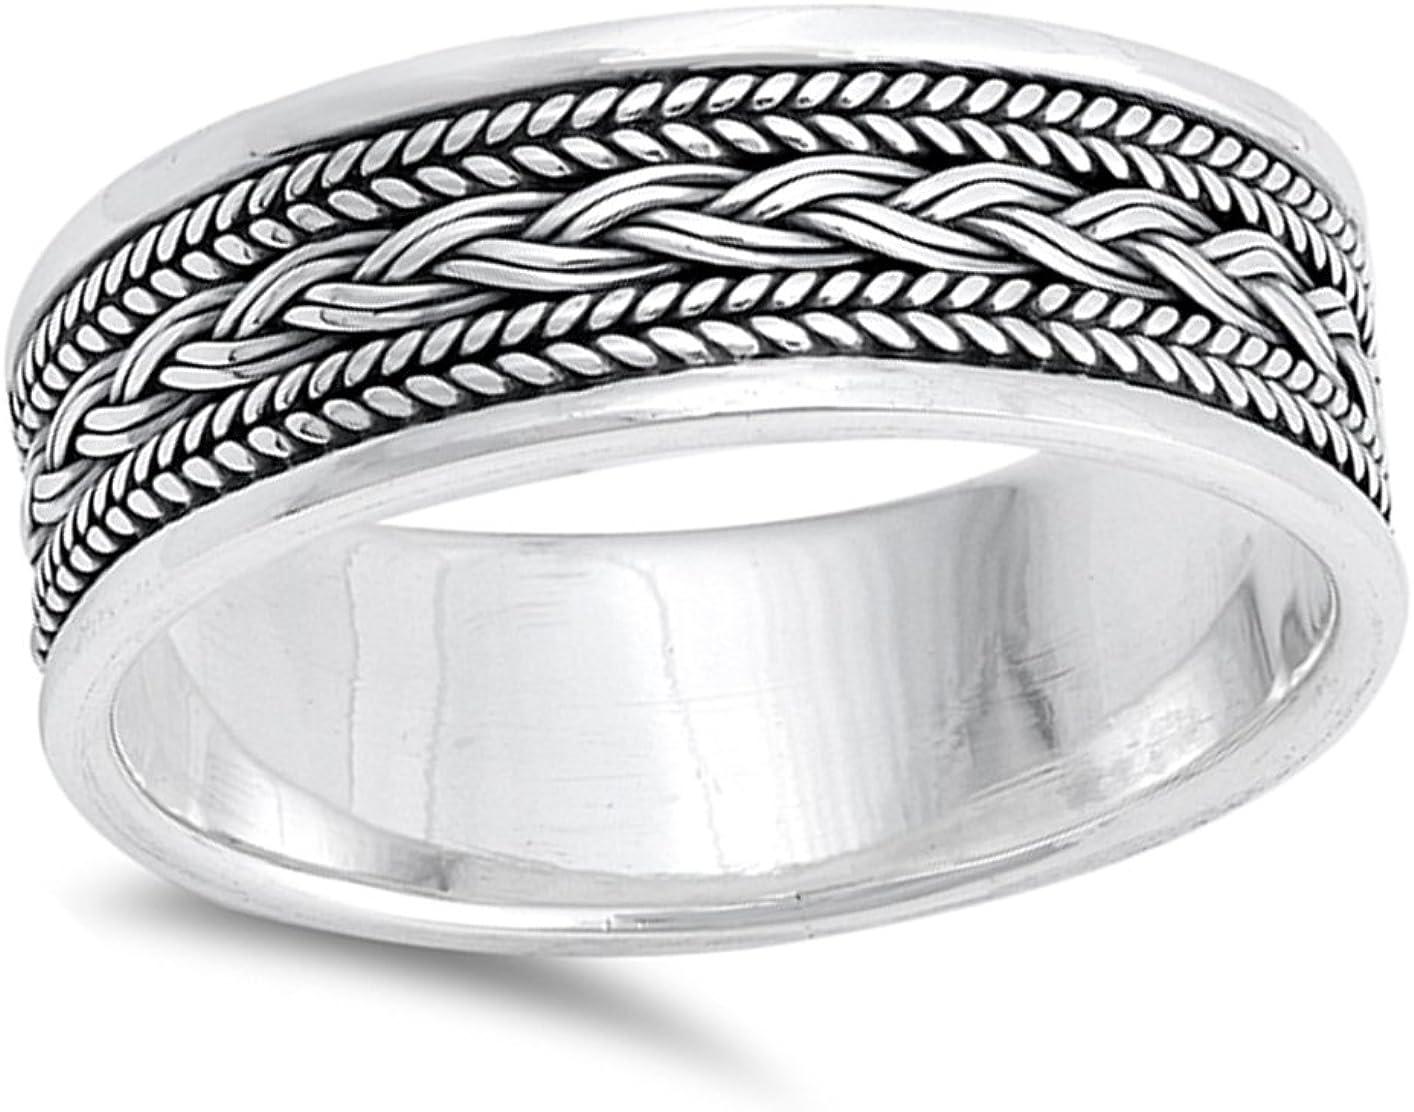 St garnet wide bands Patrick/'s day shamrock men/'s women/'s  jewelry Celtic pigtaile ornament pattern Celtic knot braid silver Ring